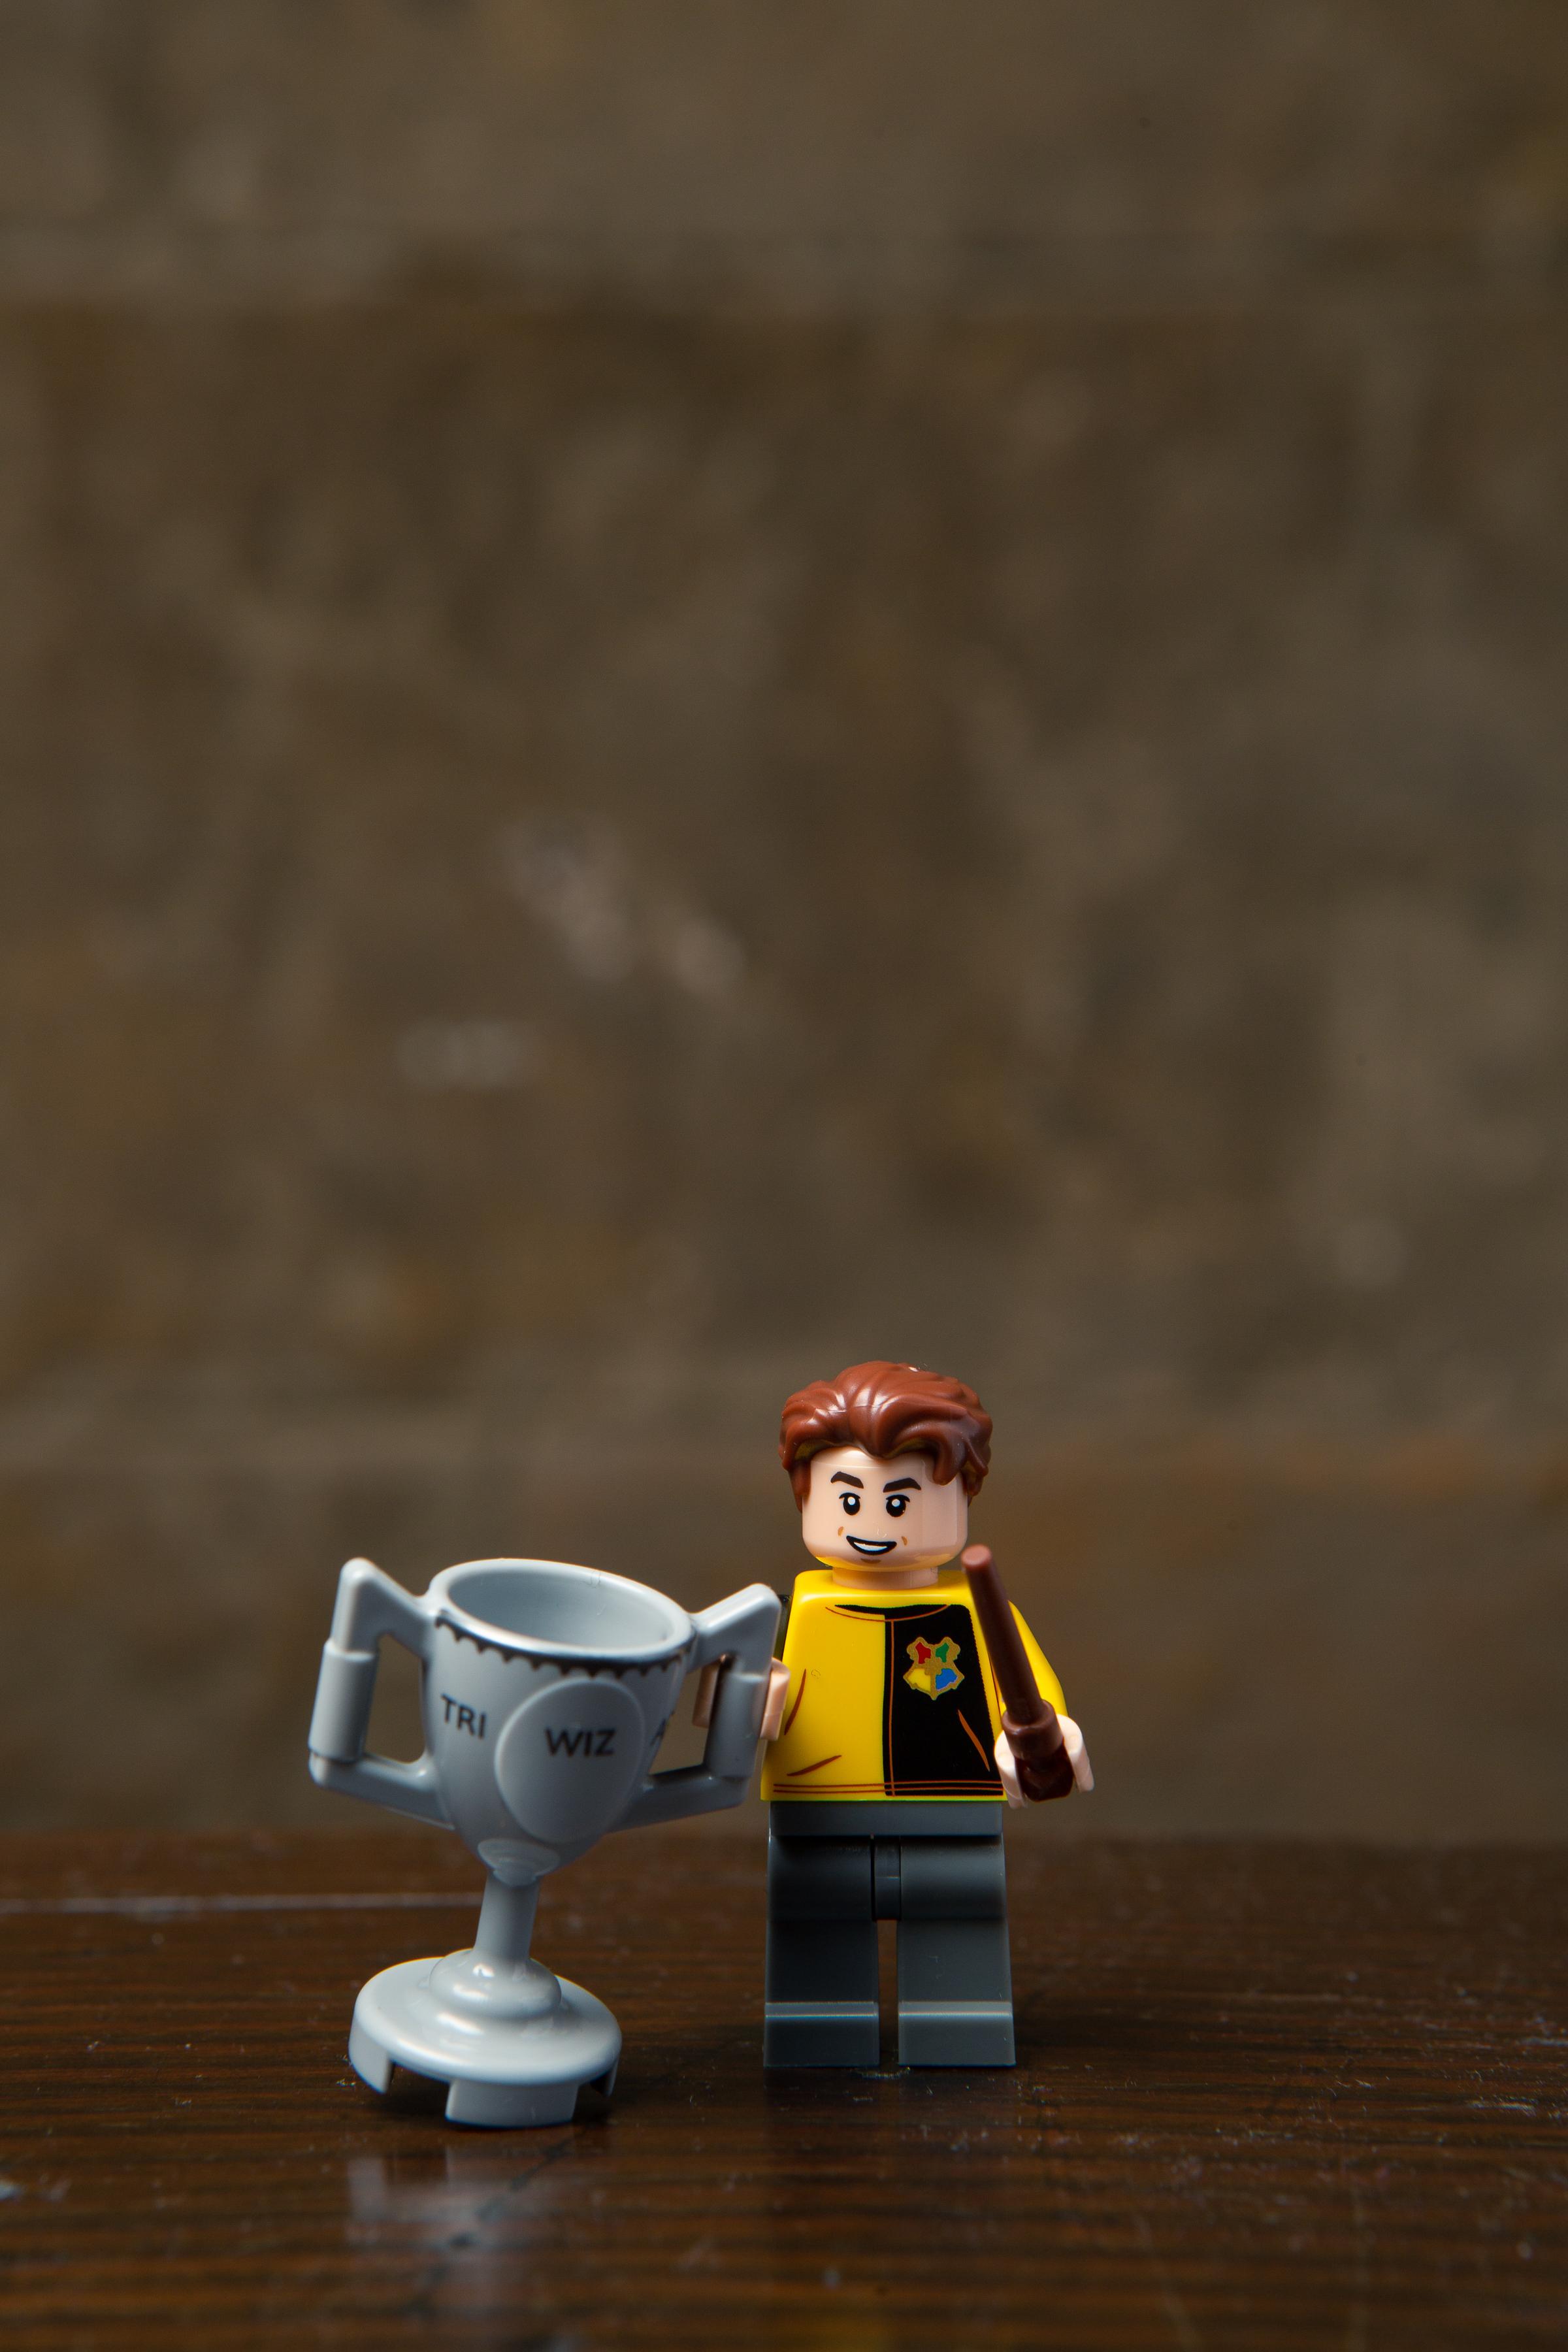 LEGO_WBST_19.06.18_hi-res-23.jpg